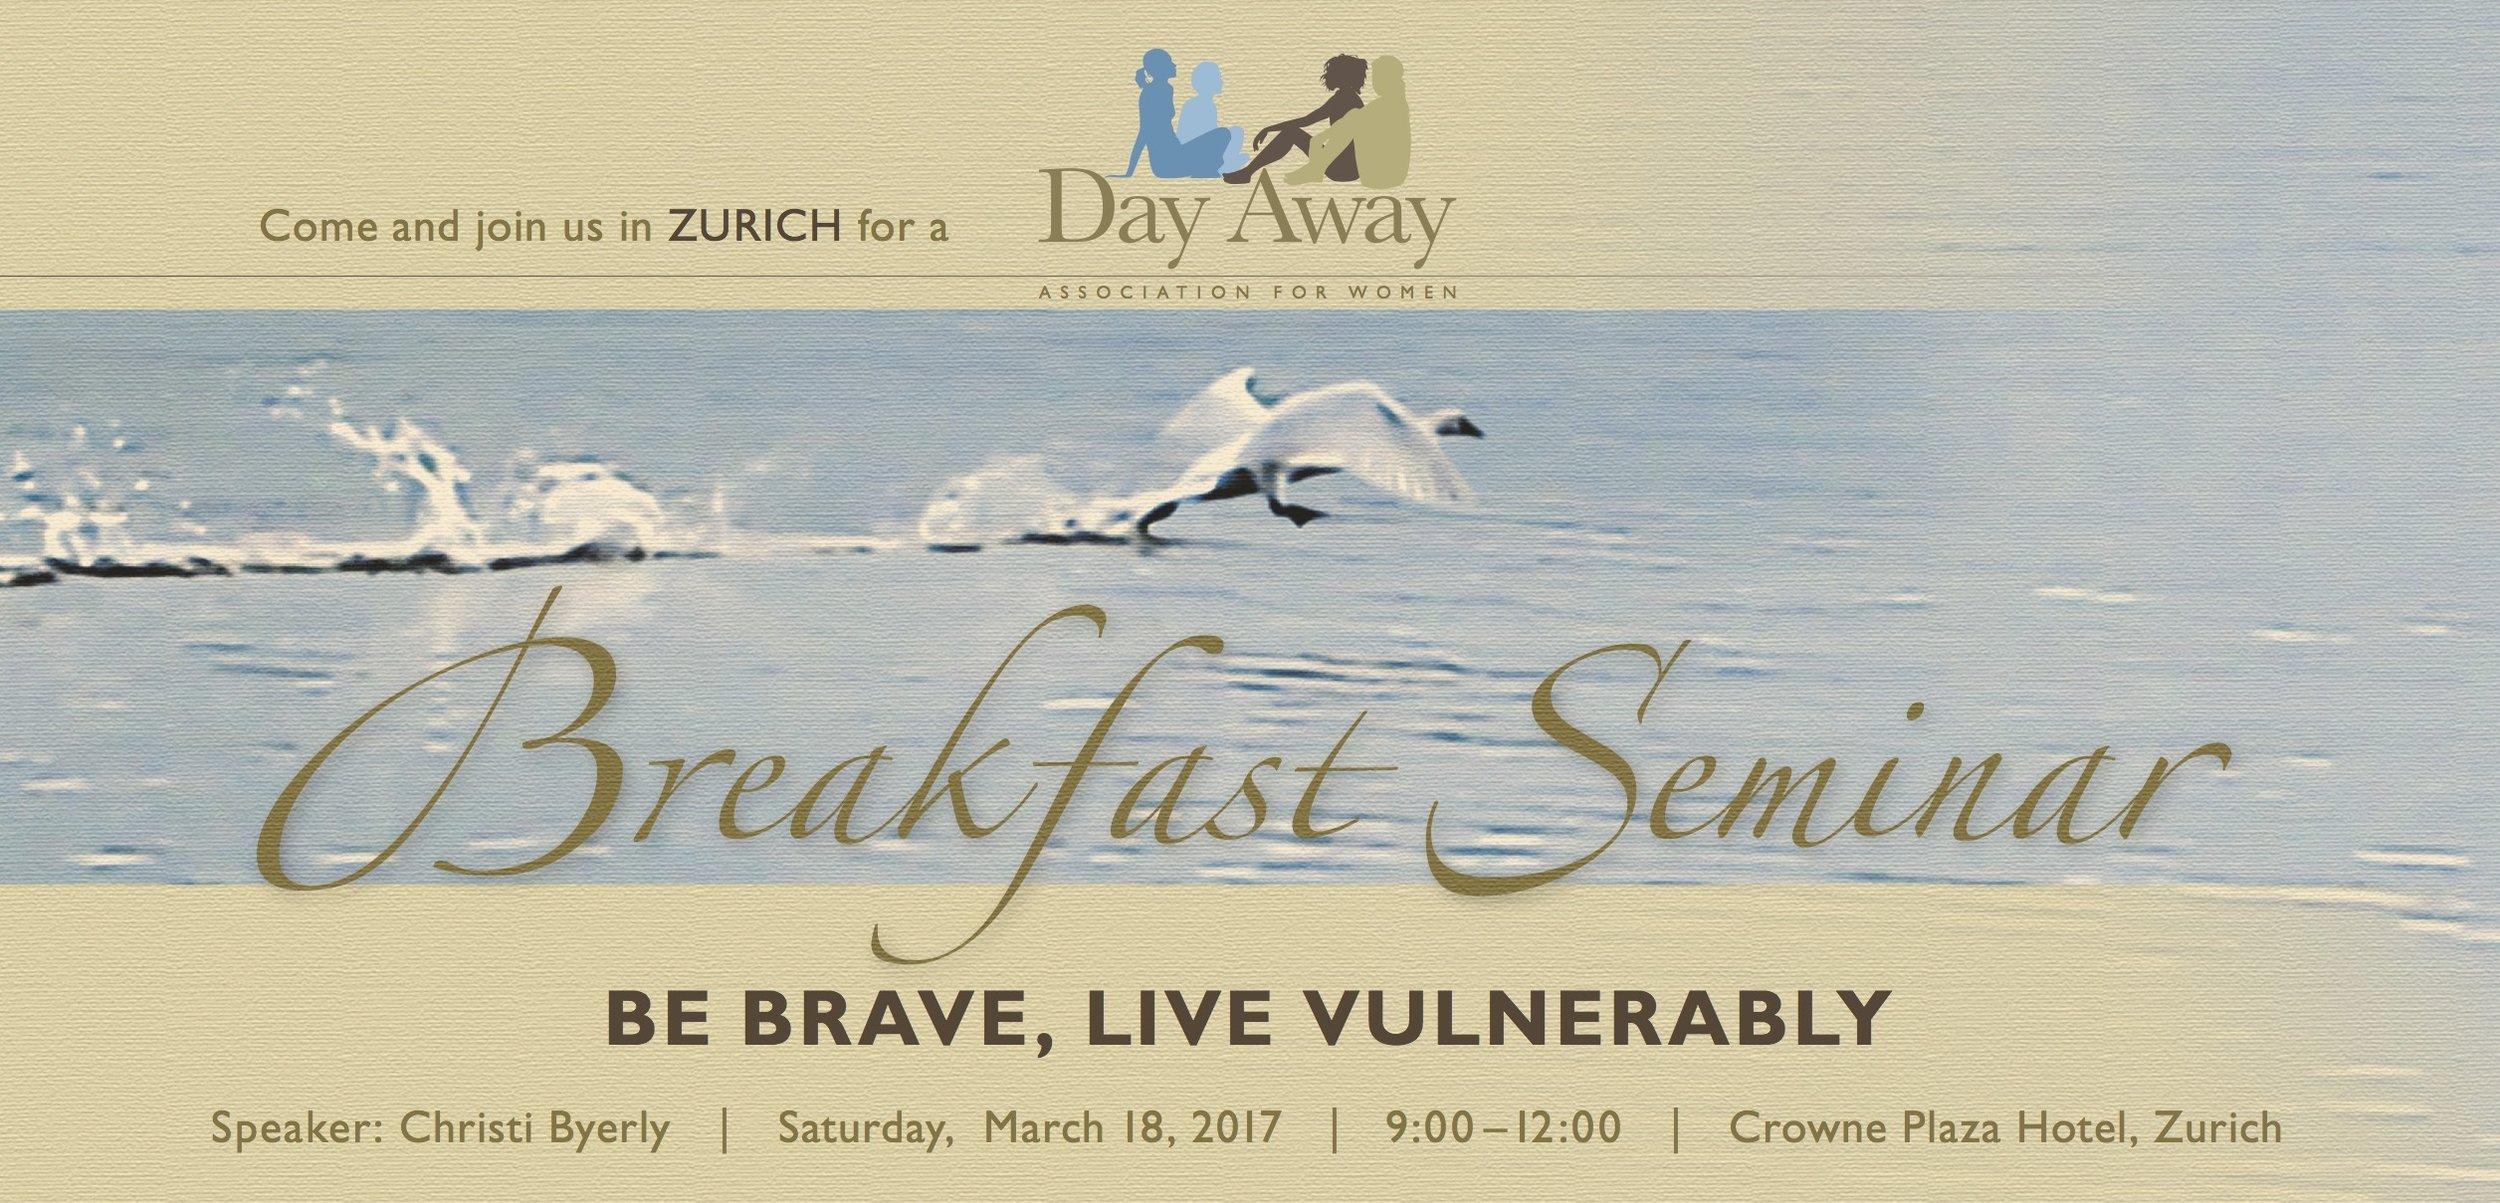 2017_Spring_Day_Away_Zurich.jpg